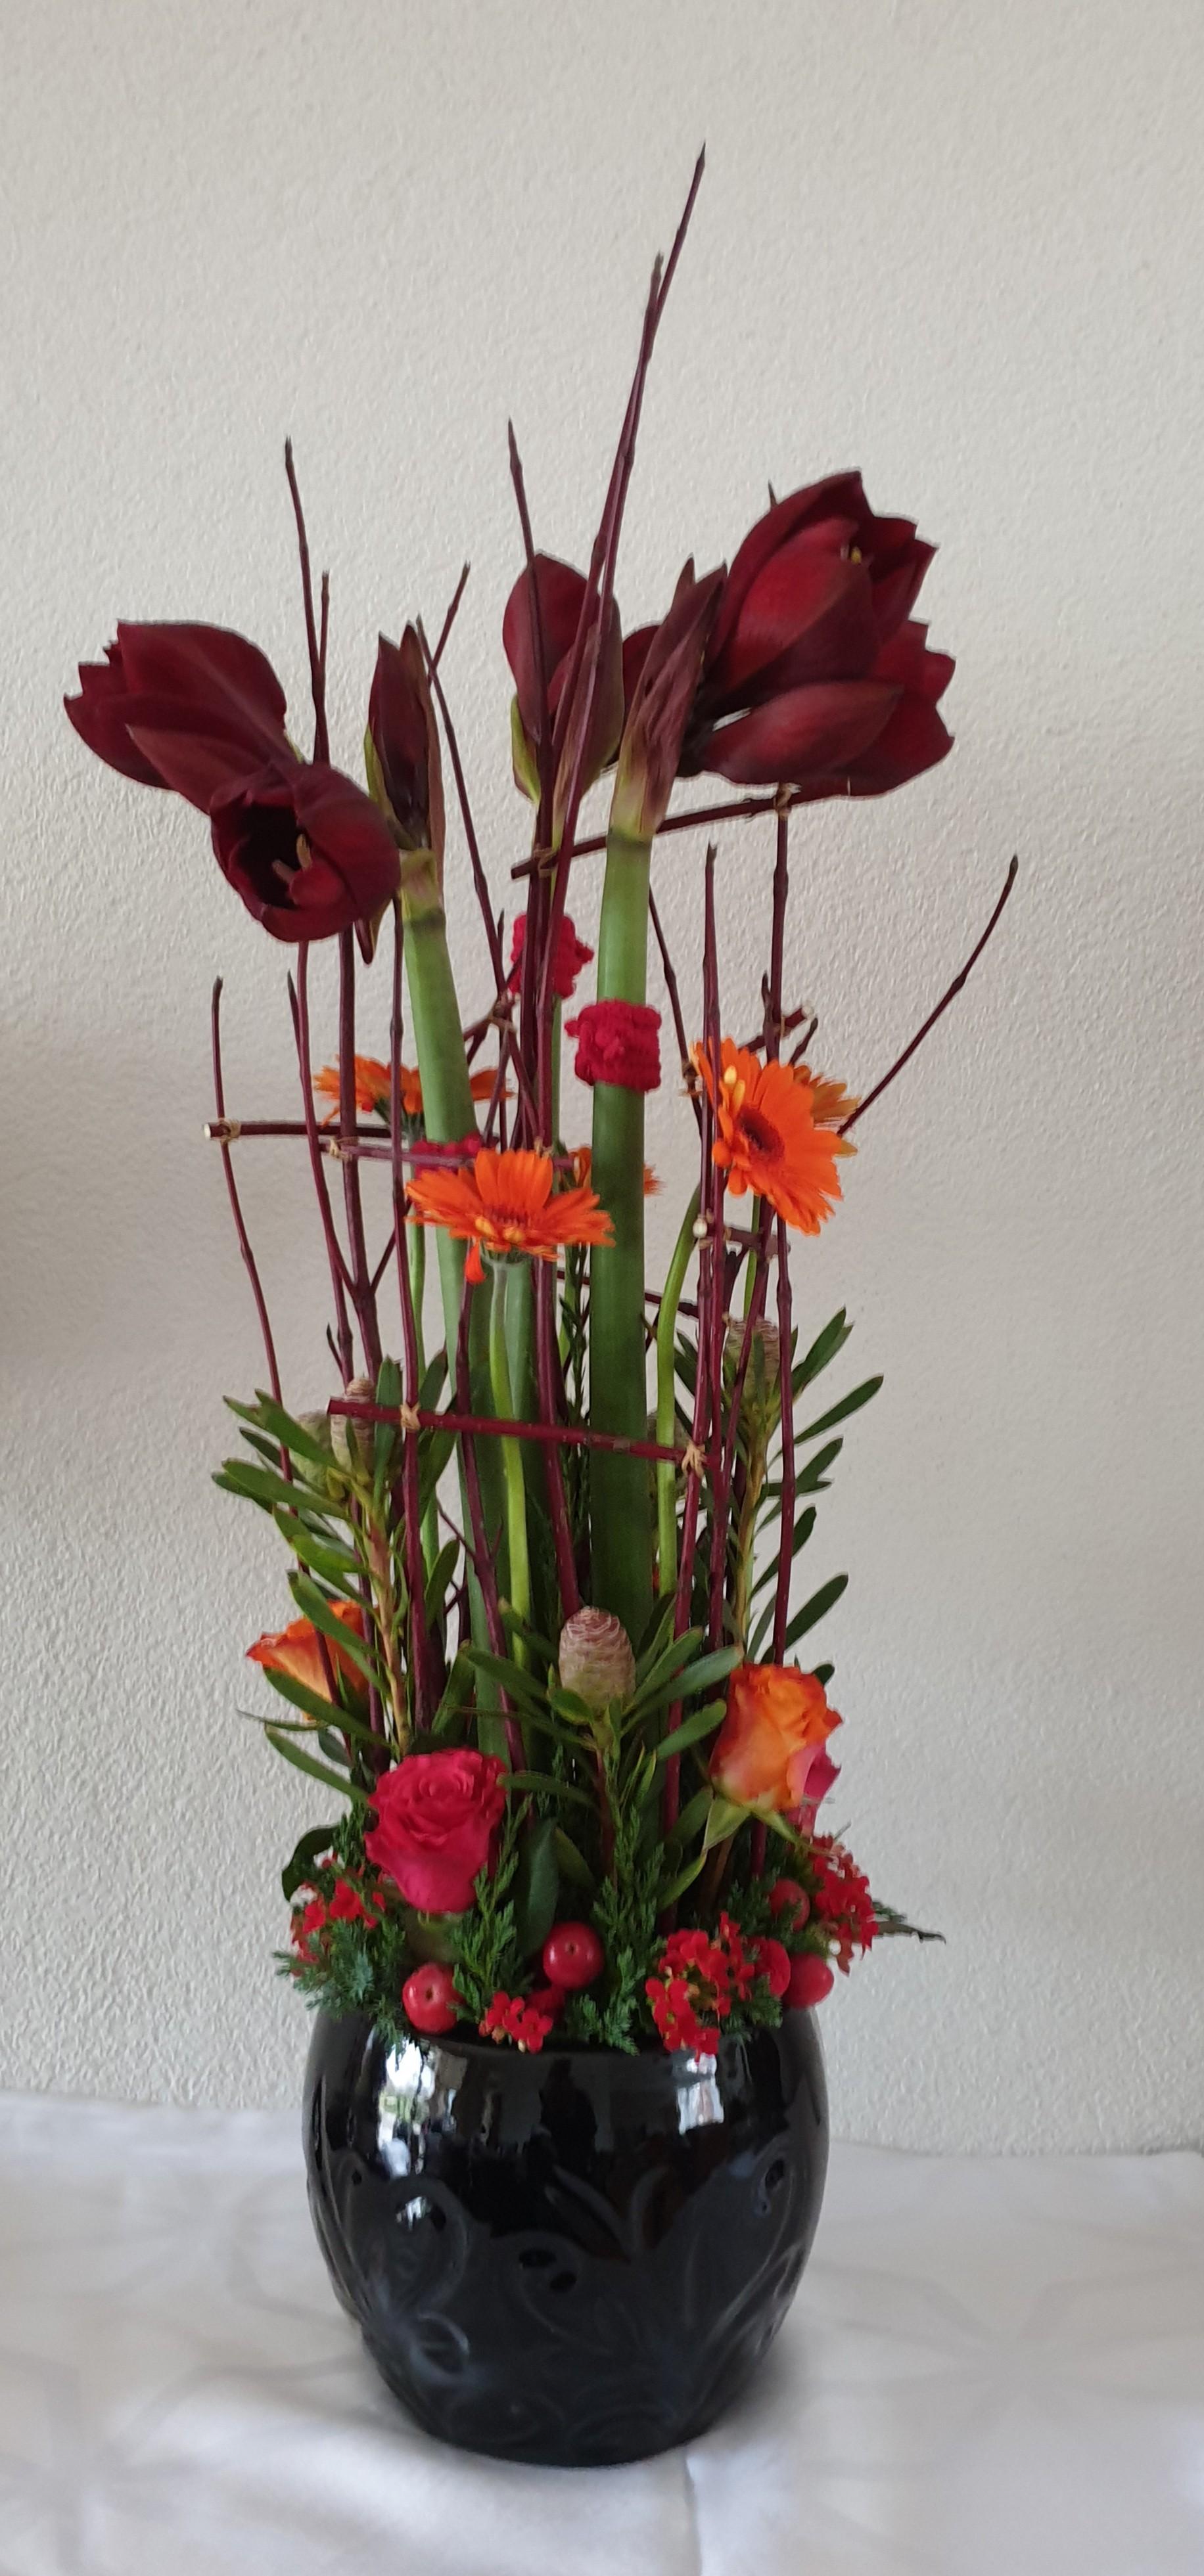 IB-050 | Amaryllis arrangement   Ine CR